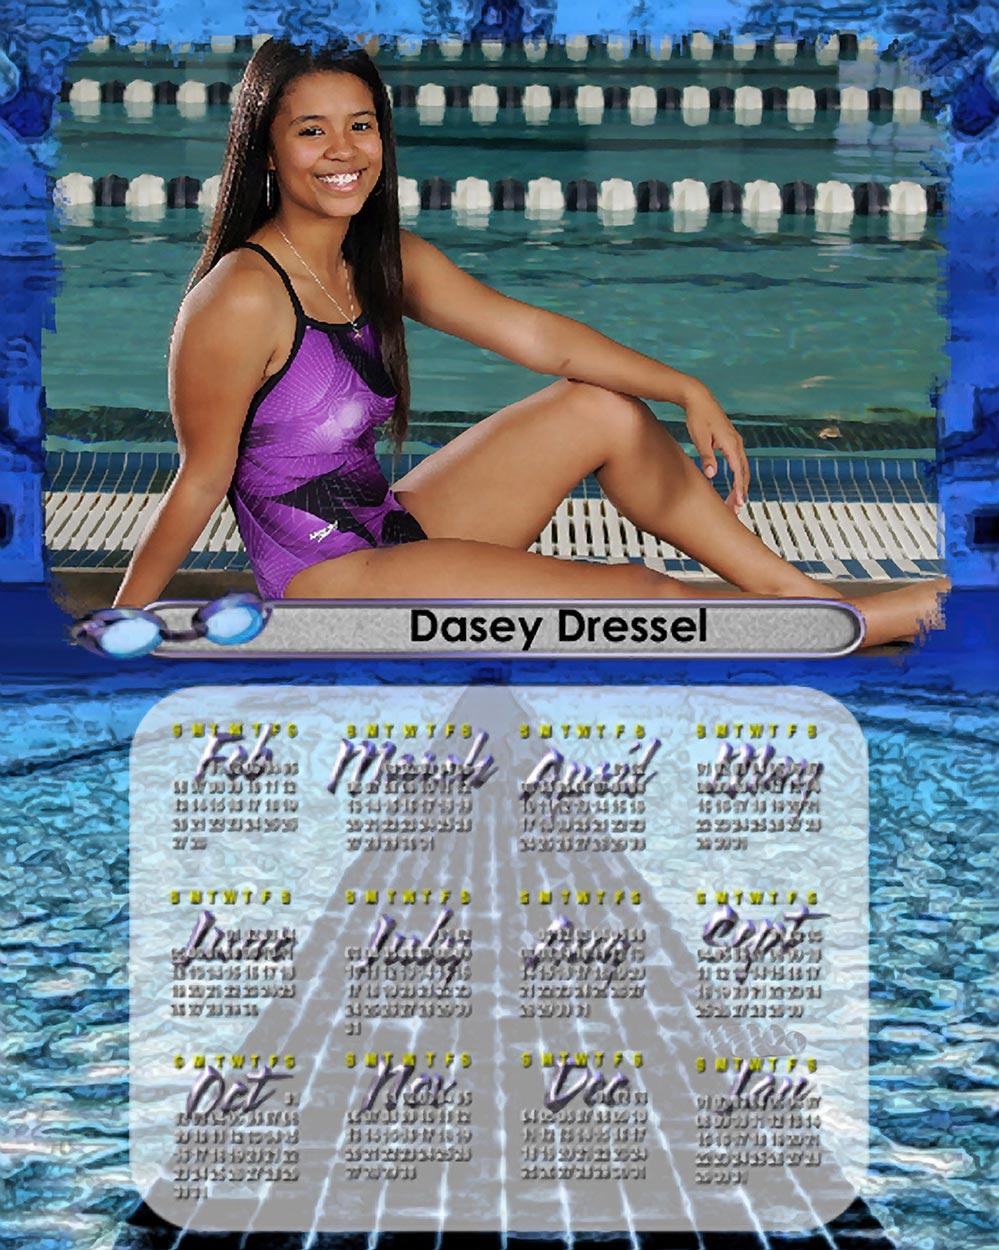 swim team calendar